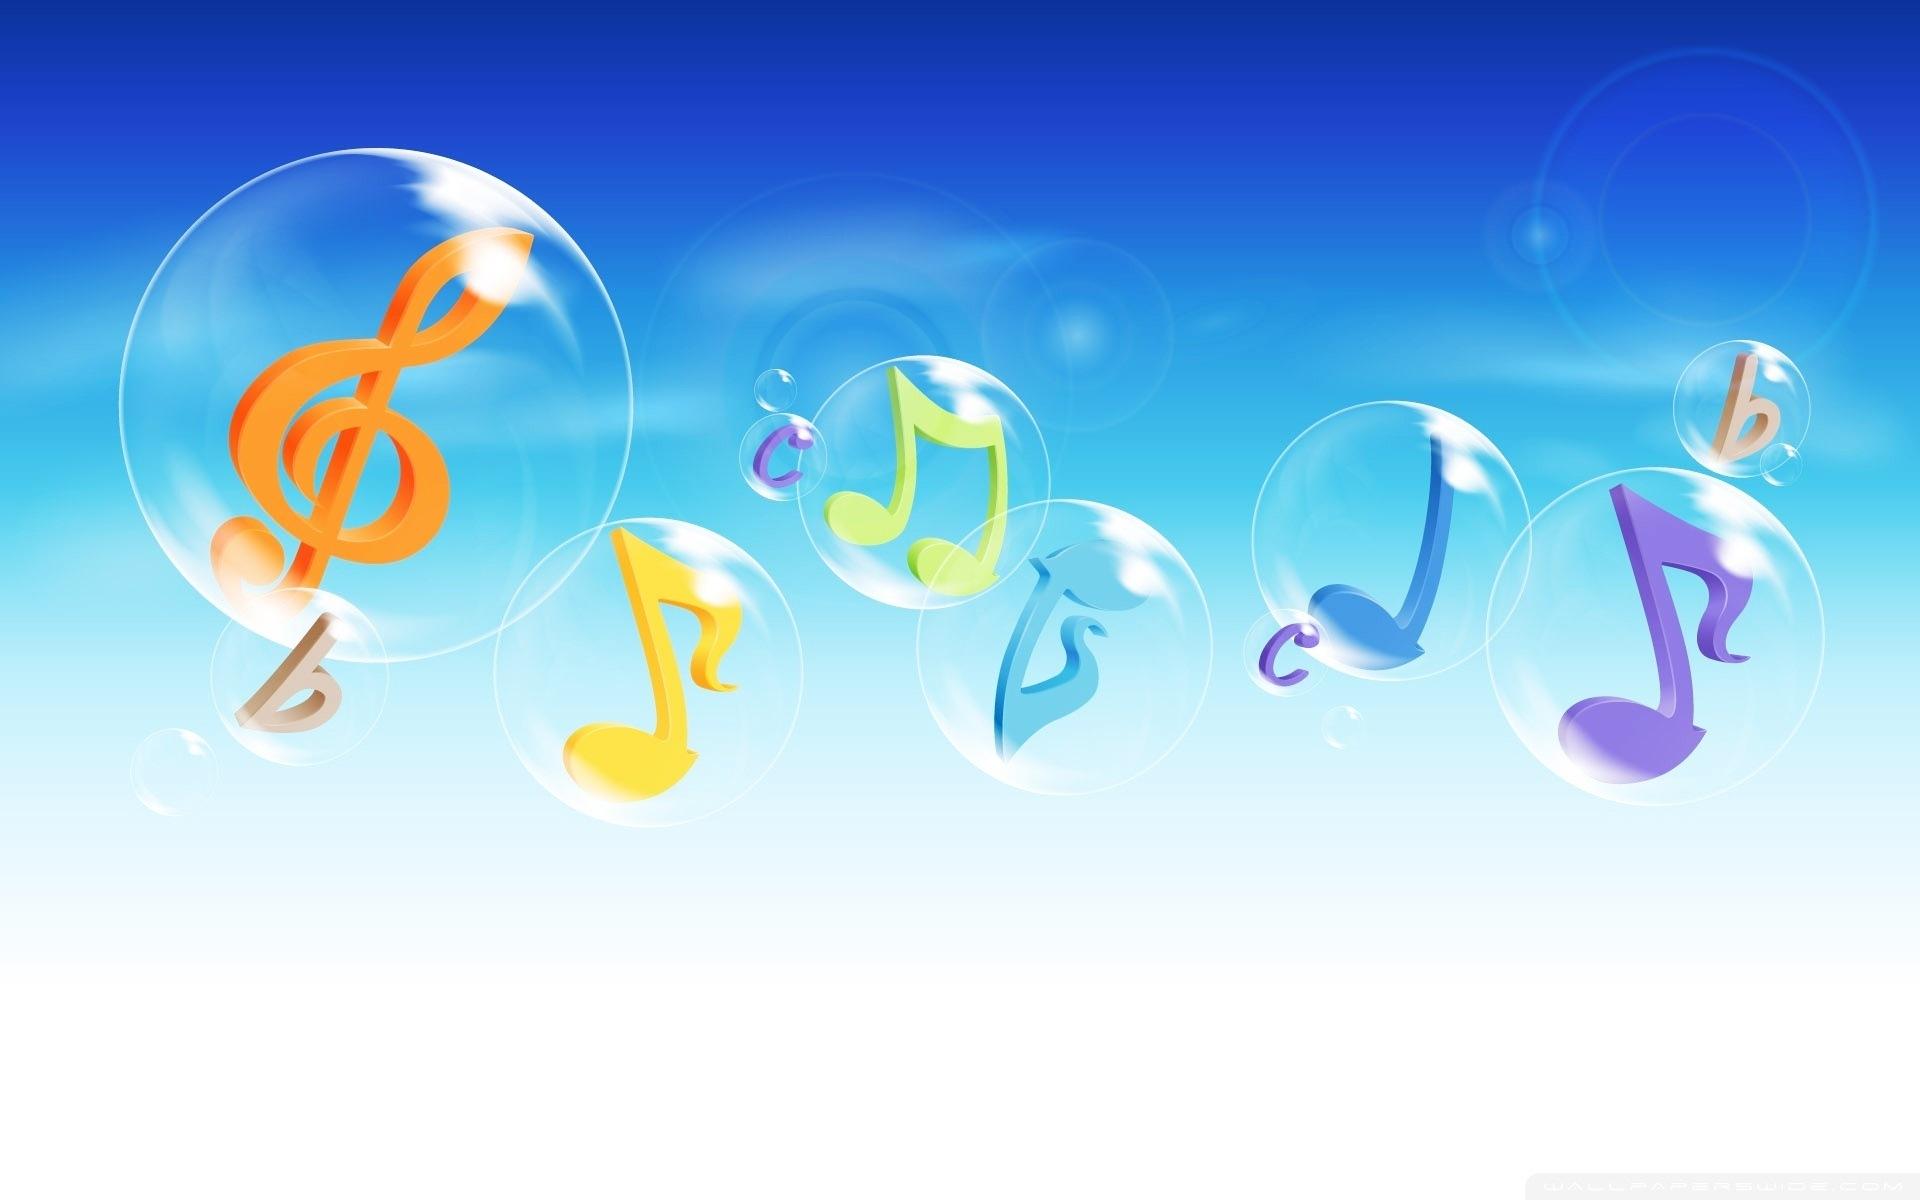 Music Background Wallpaper 007